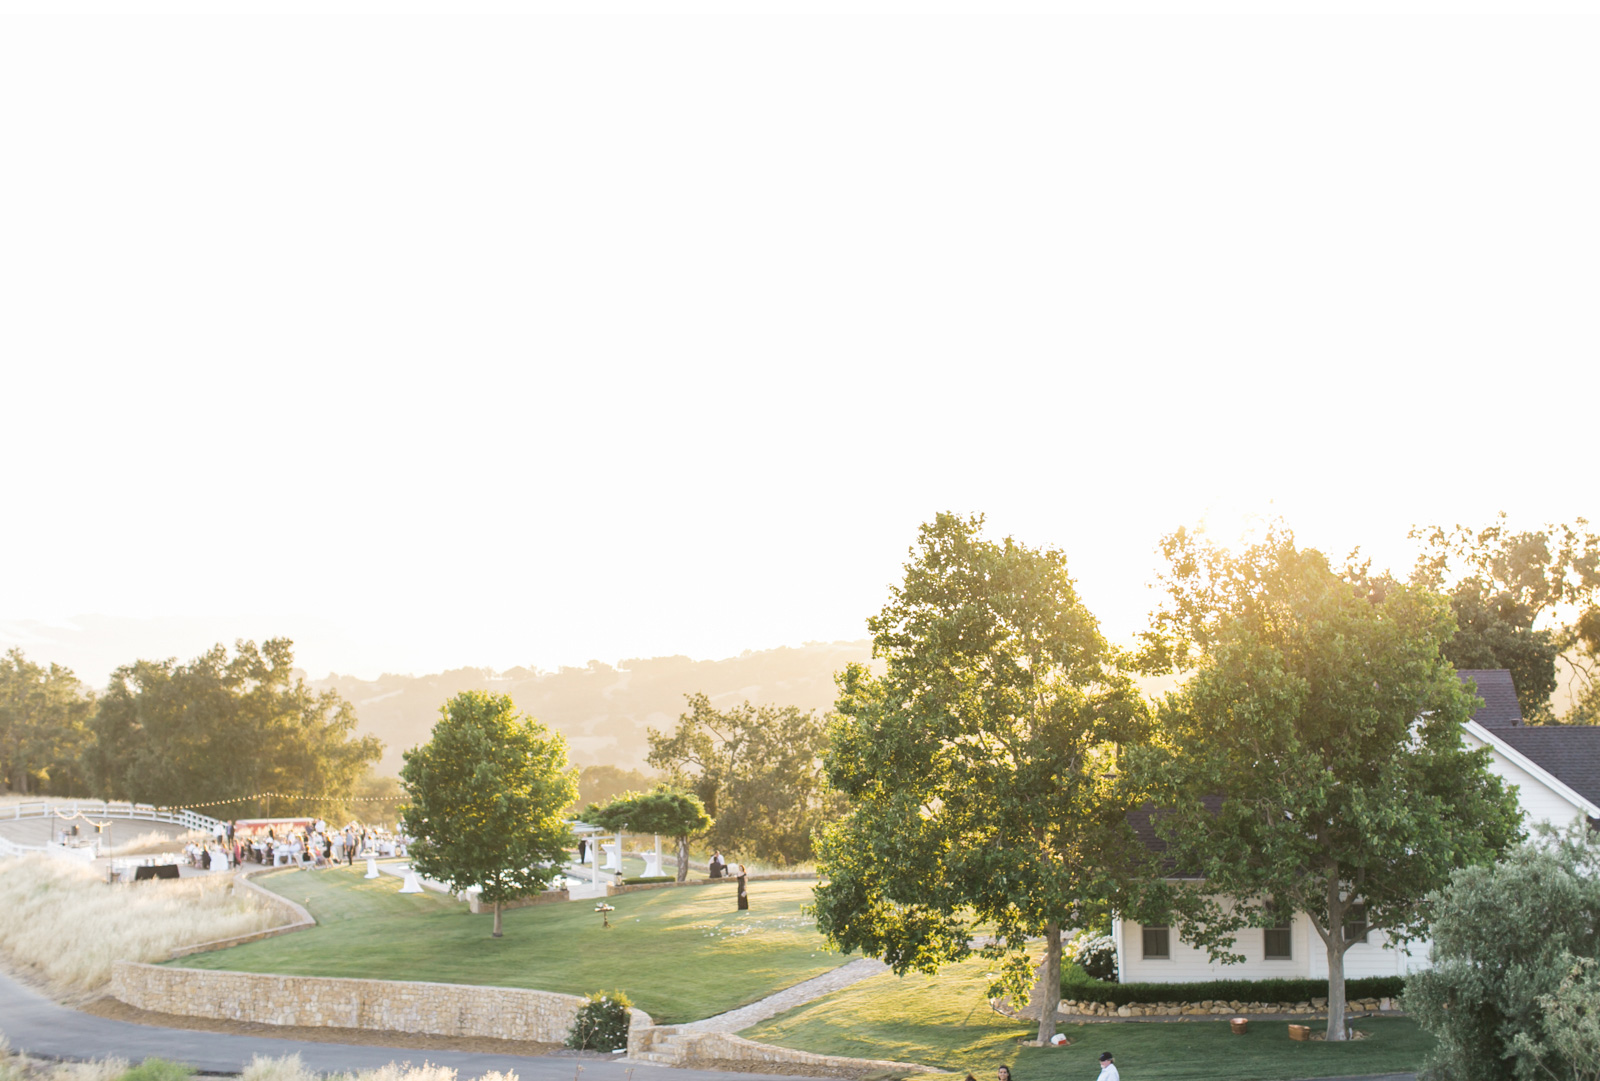 Style-Me-Pretty-California-Wedding-San-Luis-Obispo-Paso-Robles-Natalie-Schutt-Photography_16.jpg